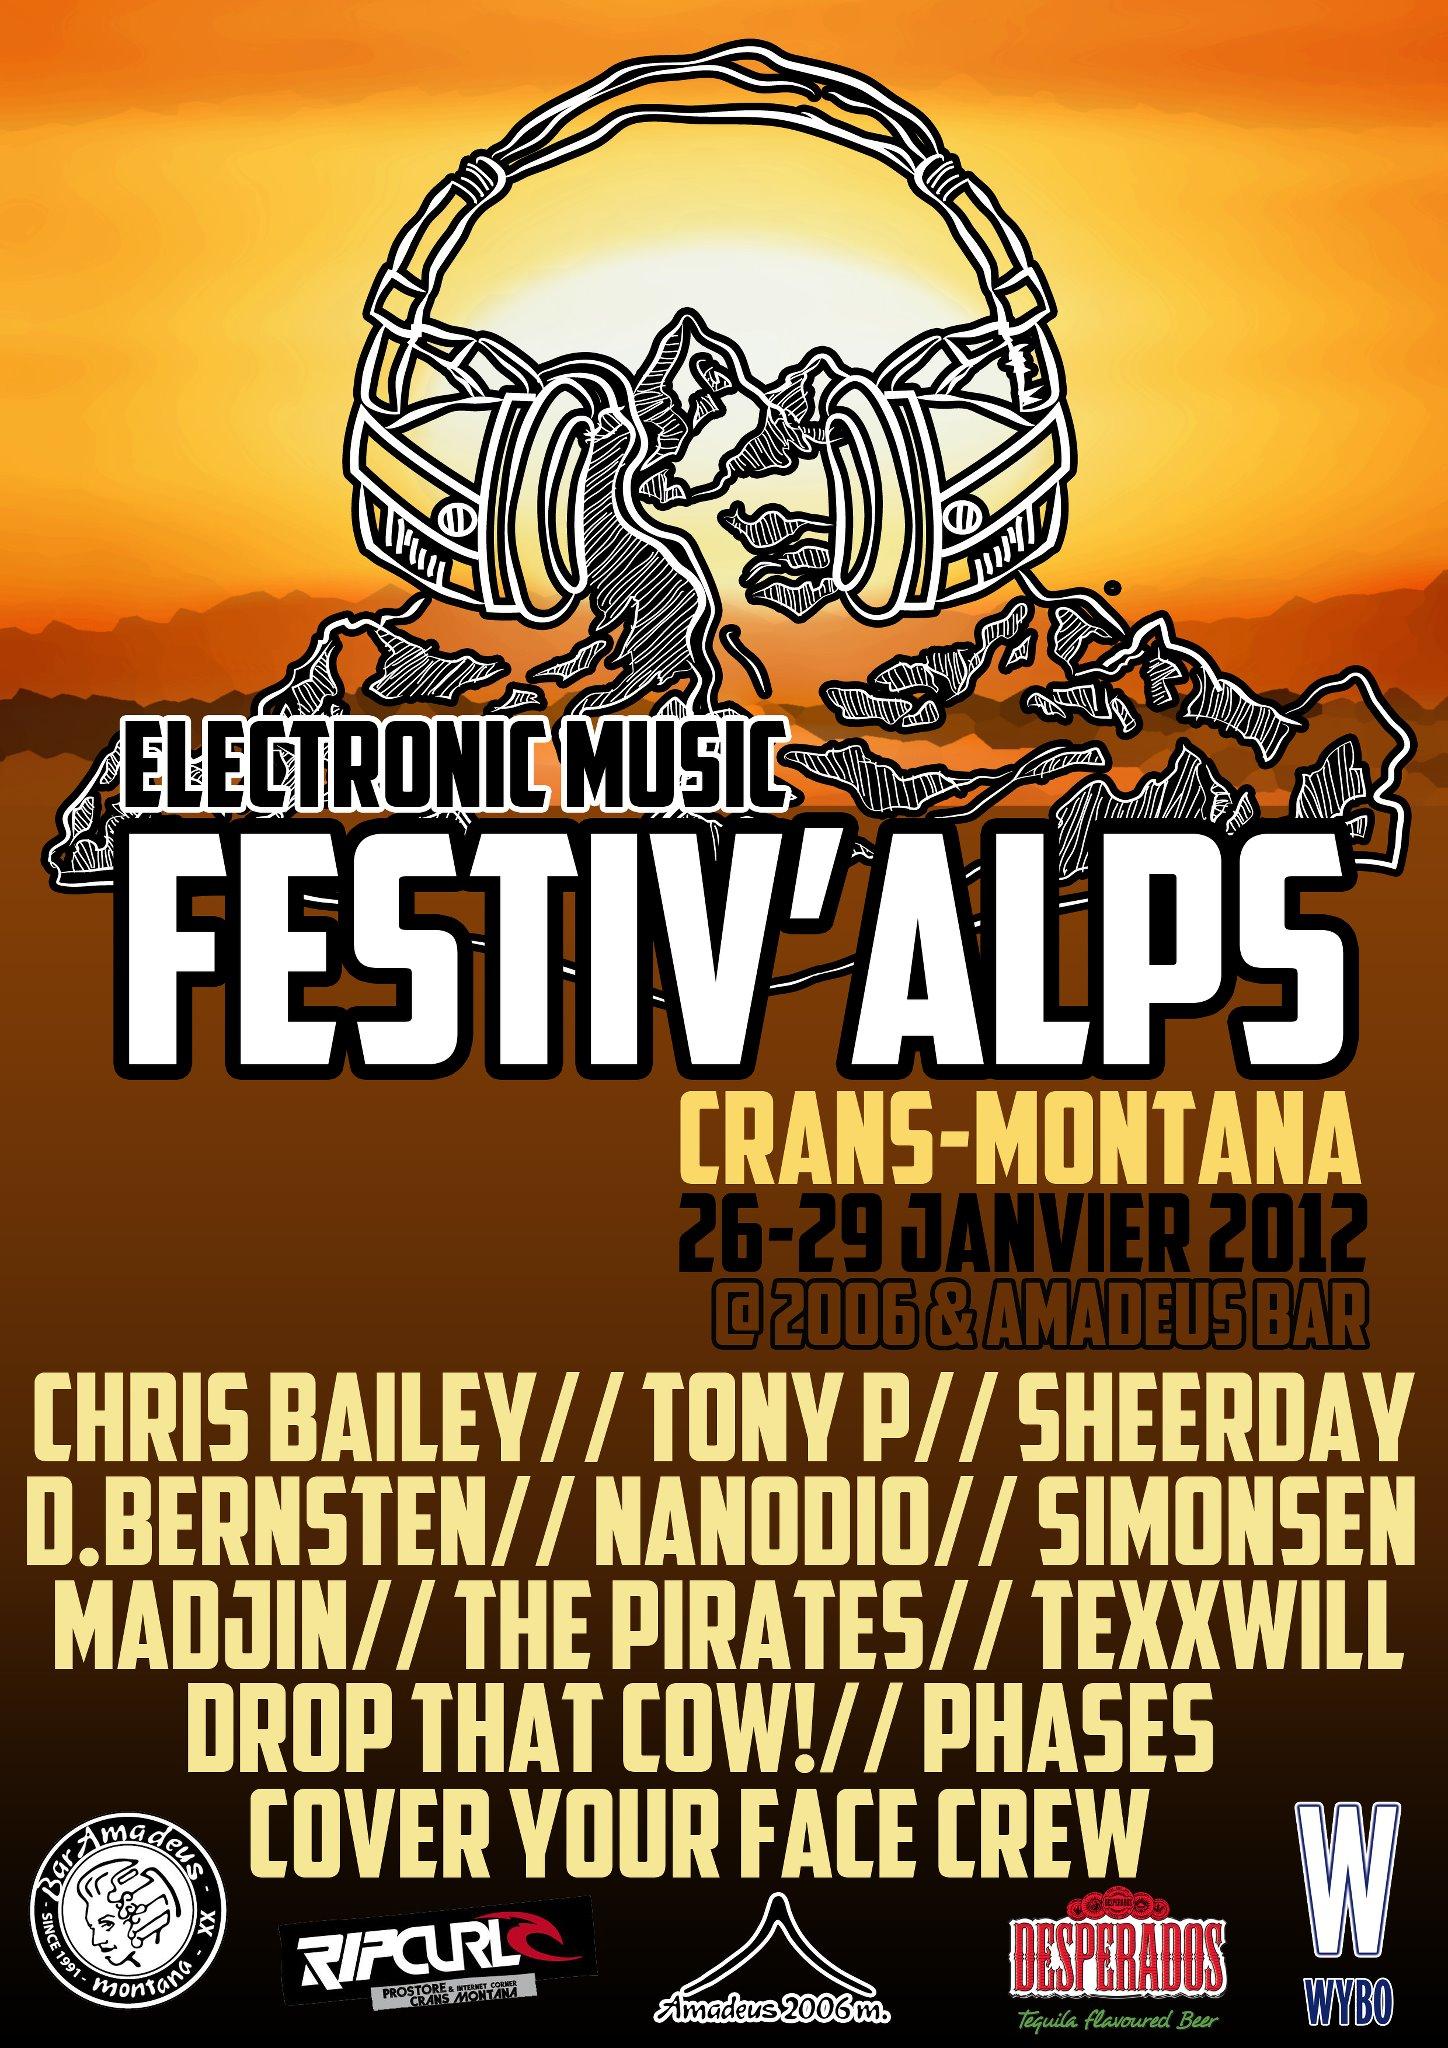 Electronic Music Festival - Crans Montana - Flyer